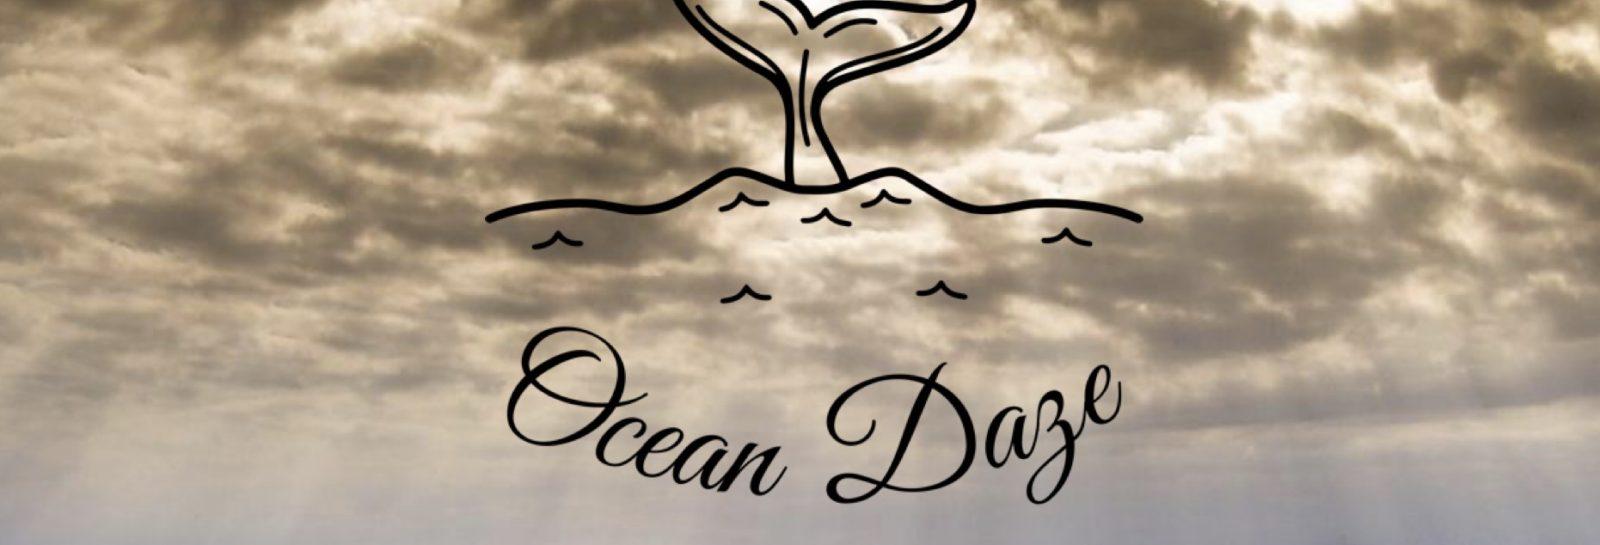 Ocean daze stormy sky